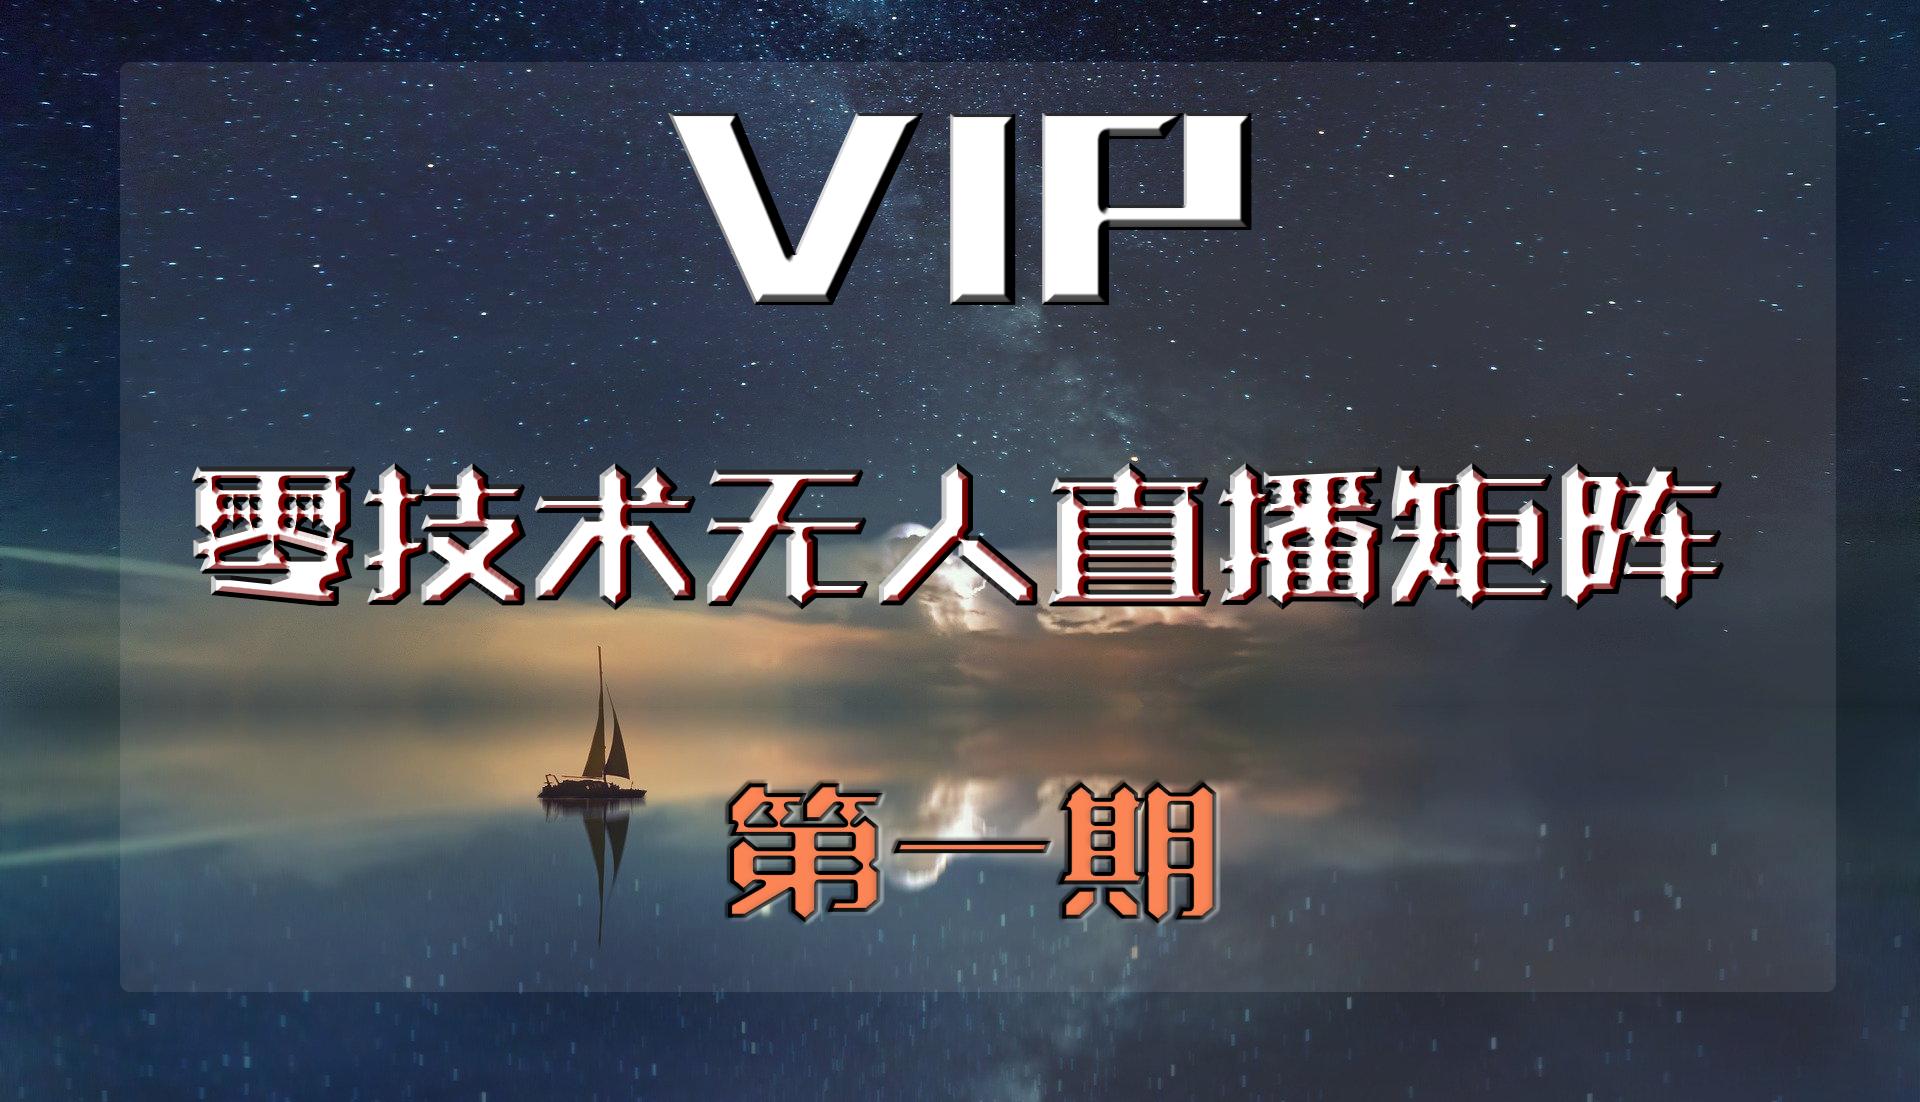 【VIP课程】零技术无人直播矩阵暴利项目,单日赚上千(第一期)